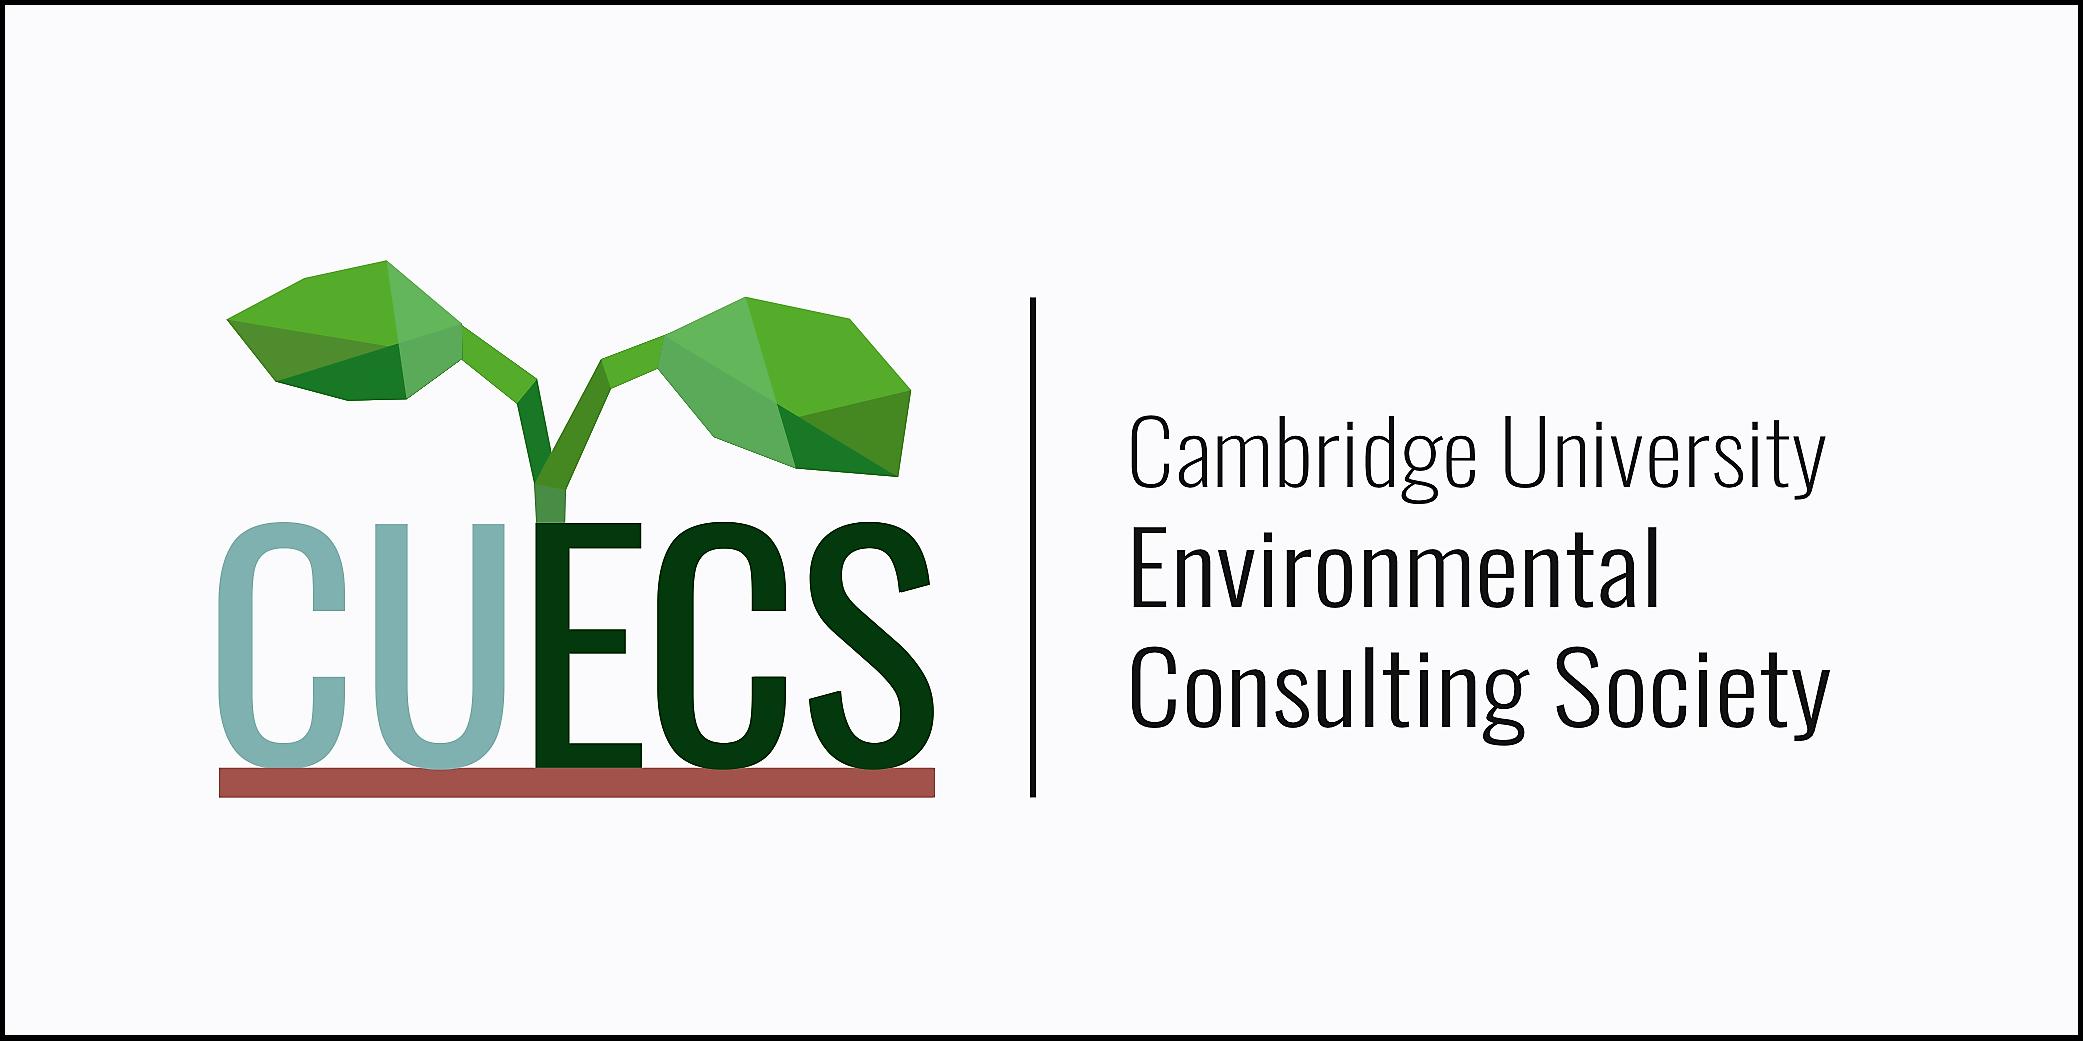 Cambridge University Environmental Consulting Society